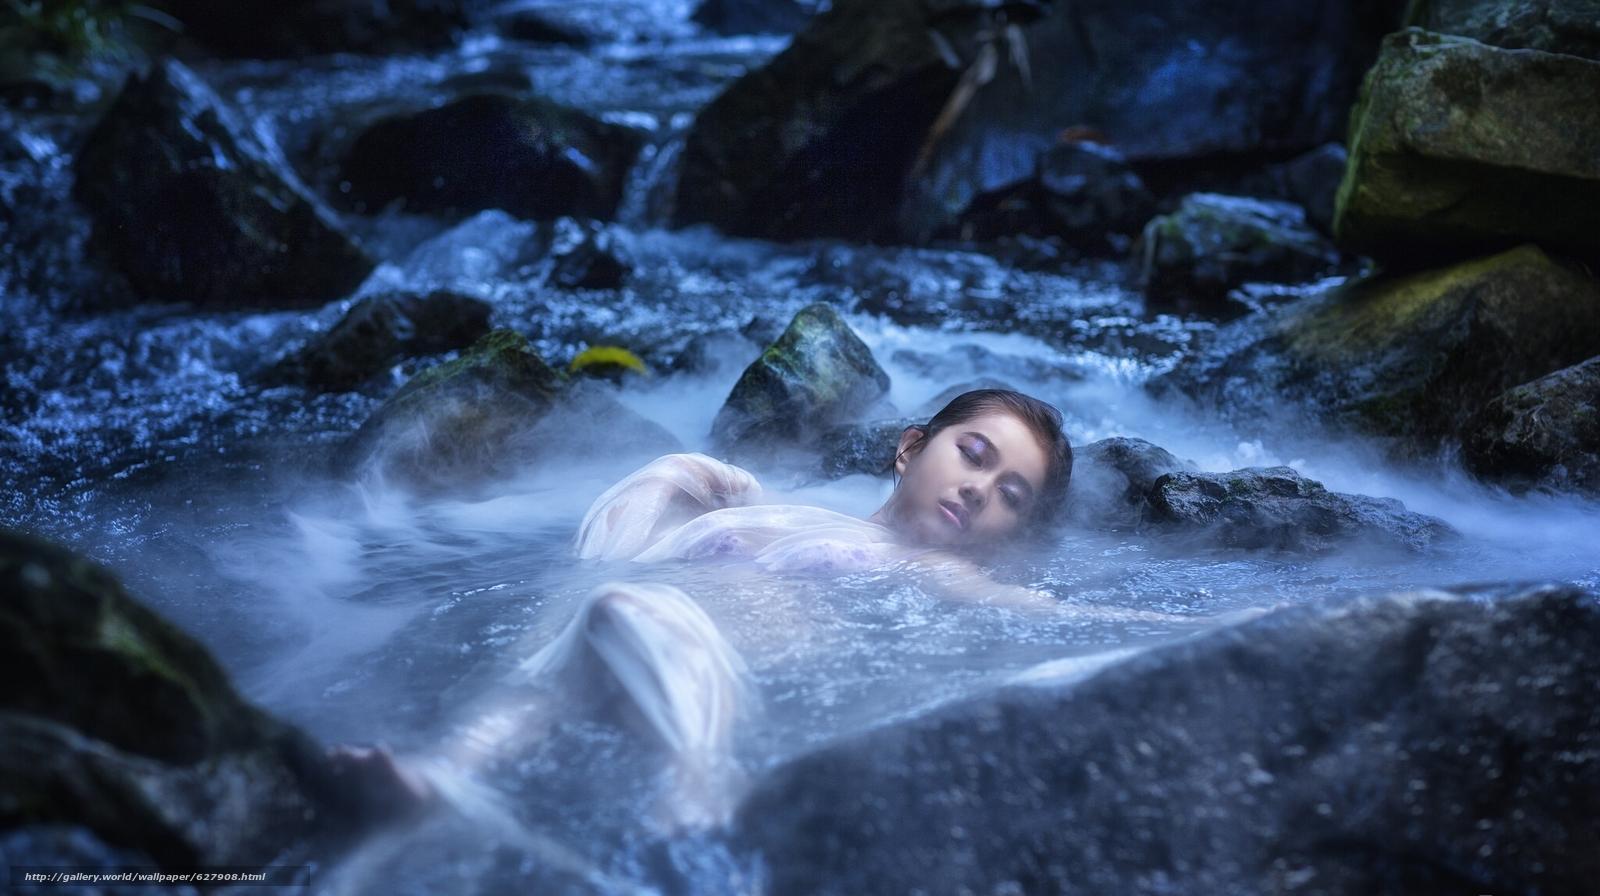 азиатка, вода, река, камни, настроение